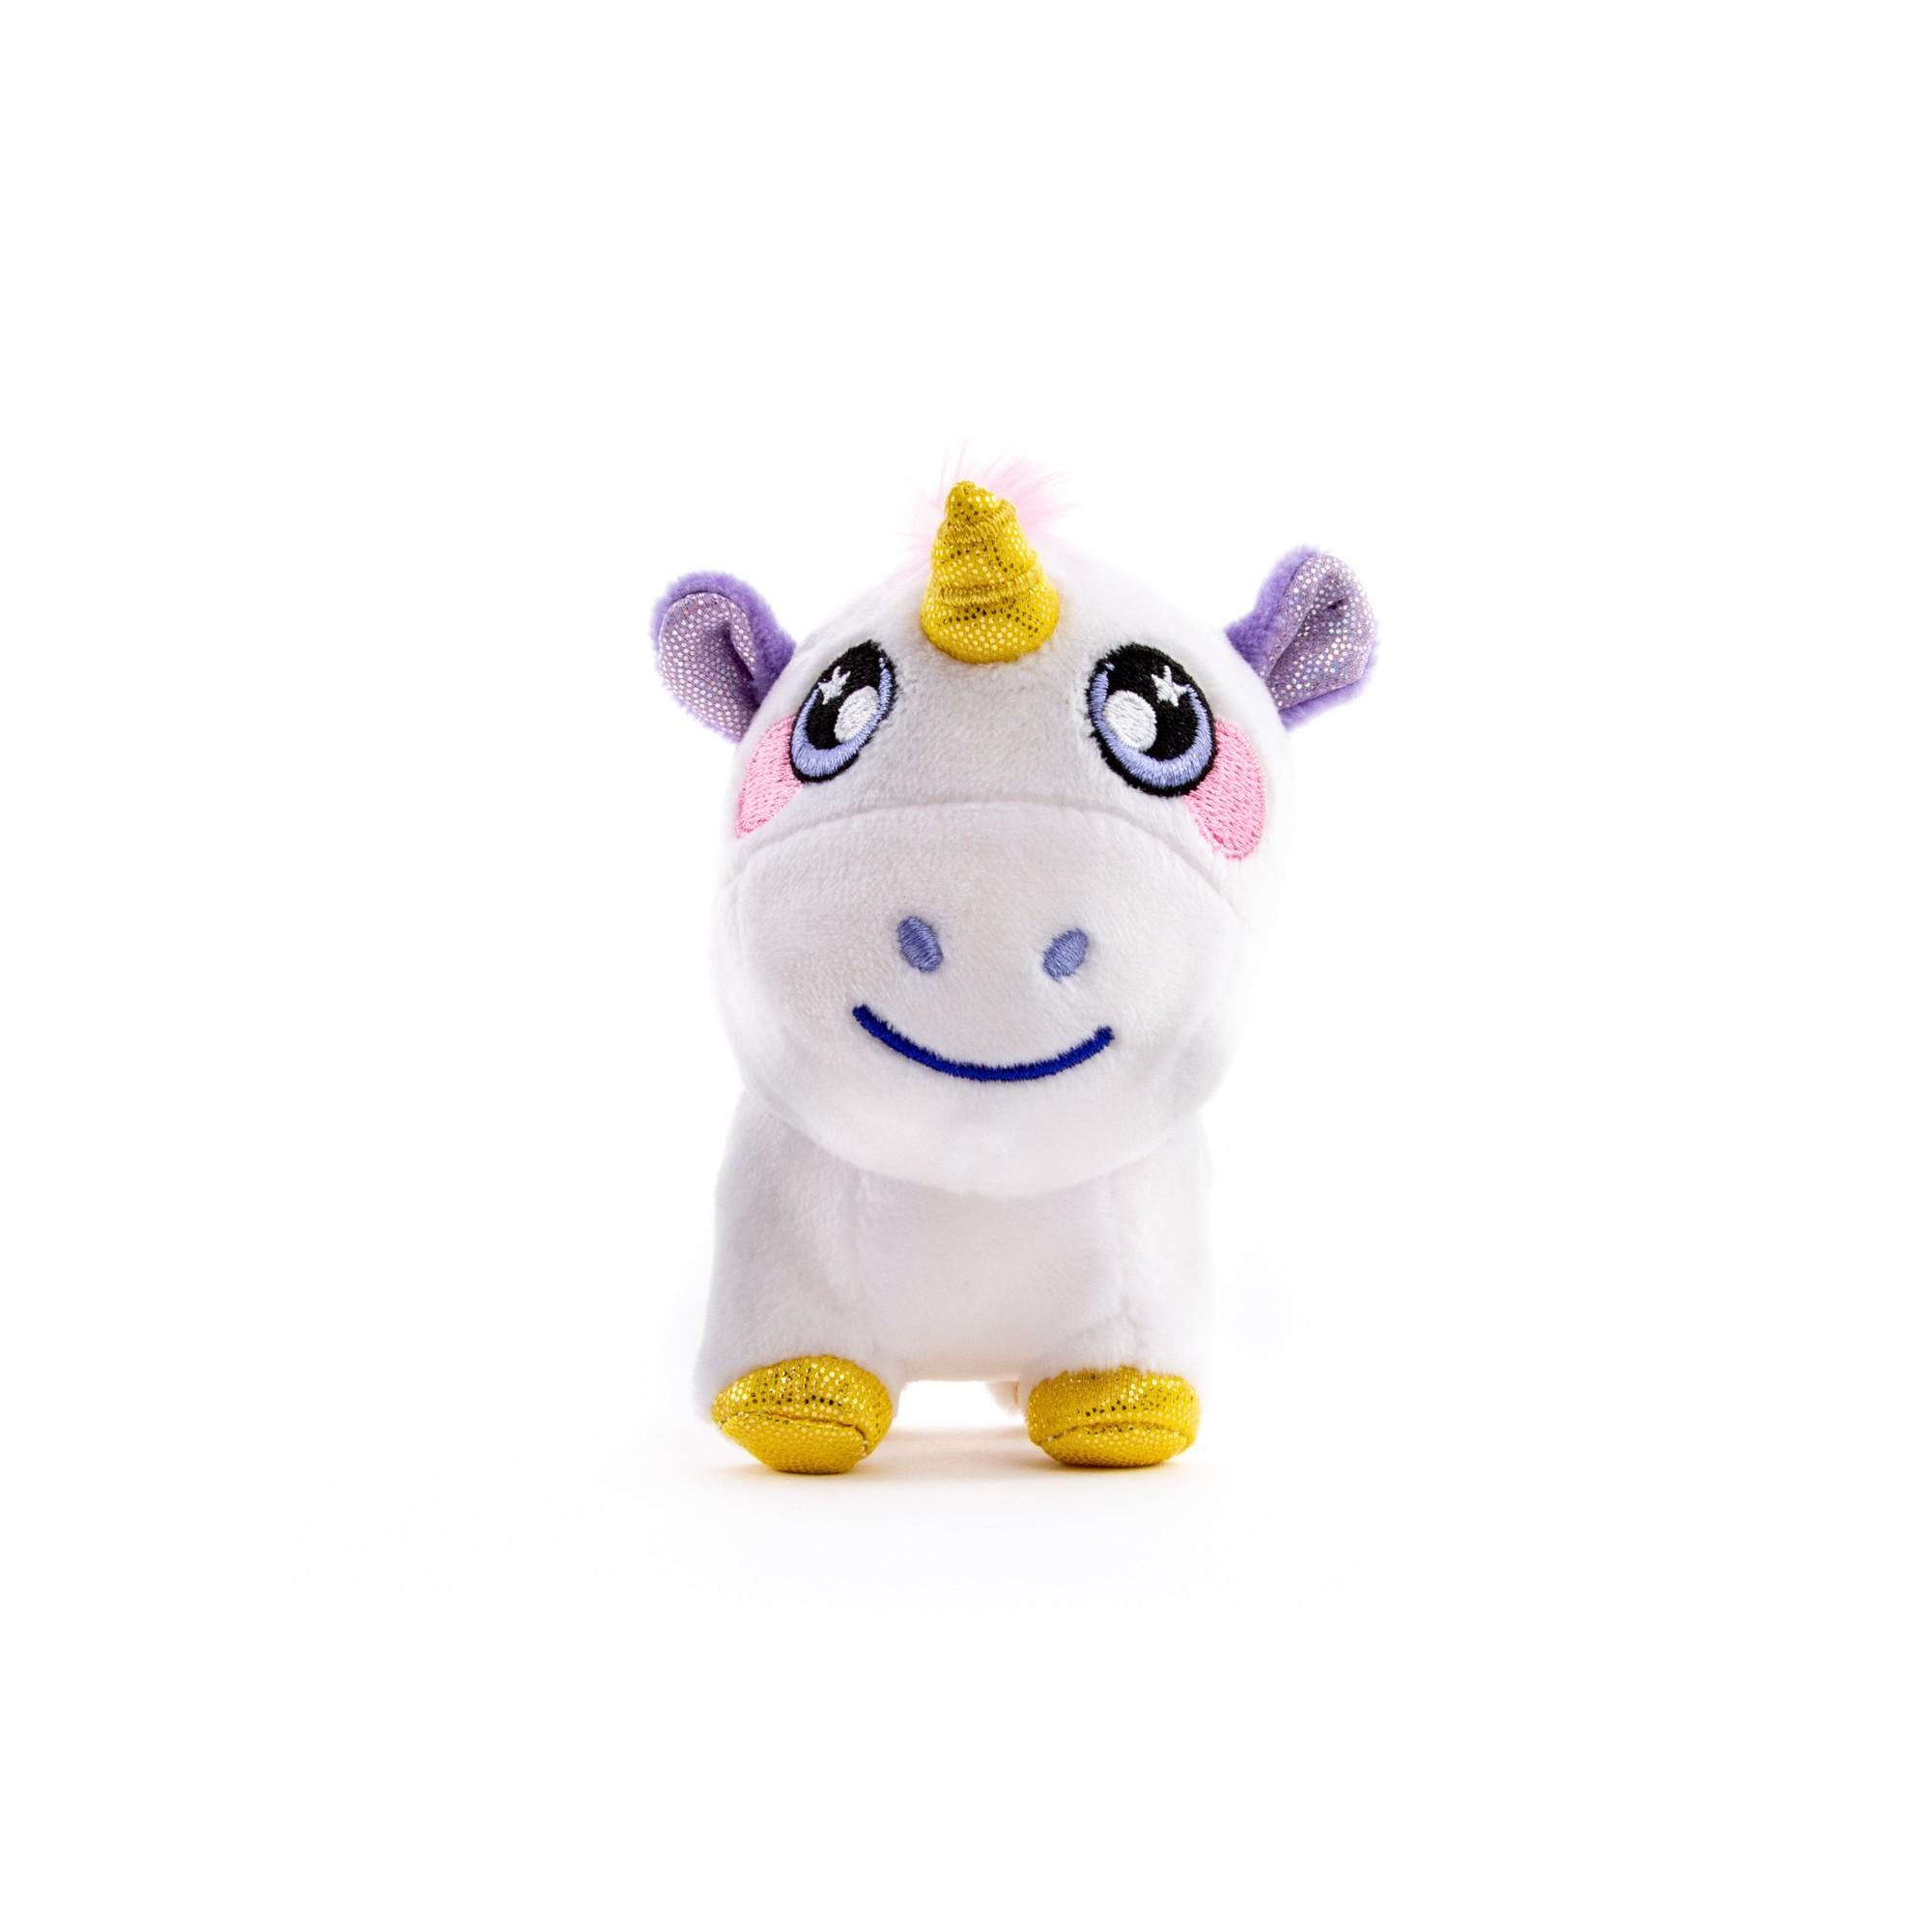 Squeezamals 3Deez Slow-Rise Foam Stuffed Animal (Unicorn-Nana) $3.88 & More + Free Shipping w/ Walmart+ or FS on $35+